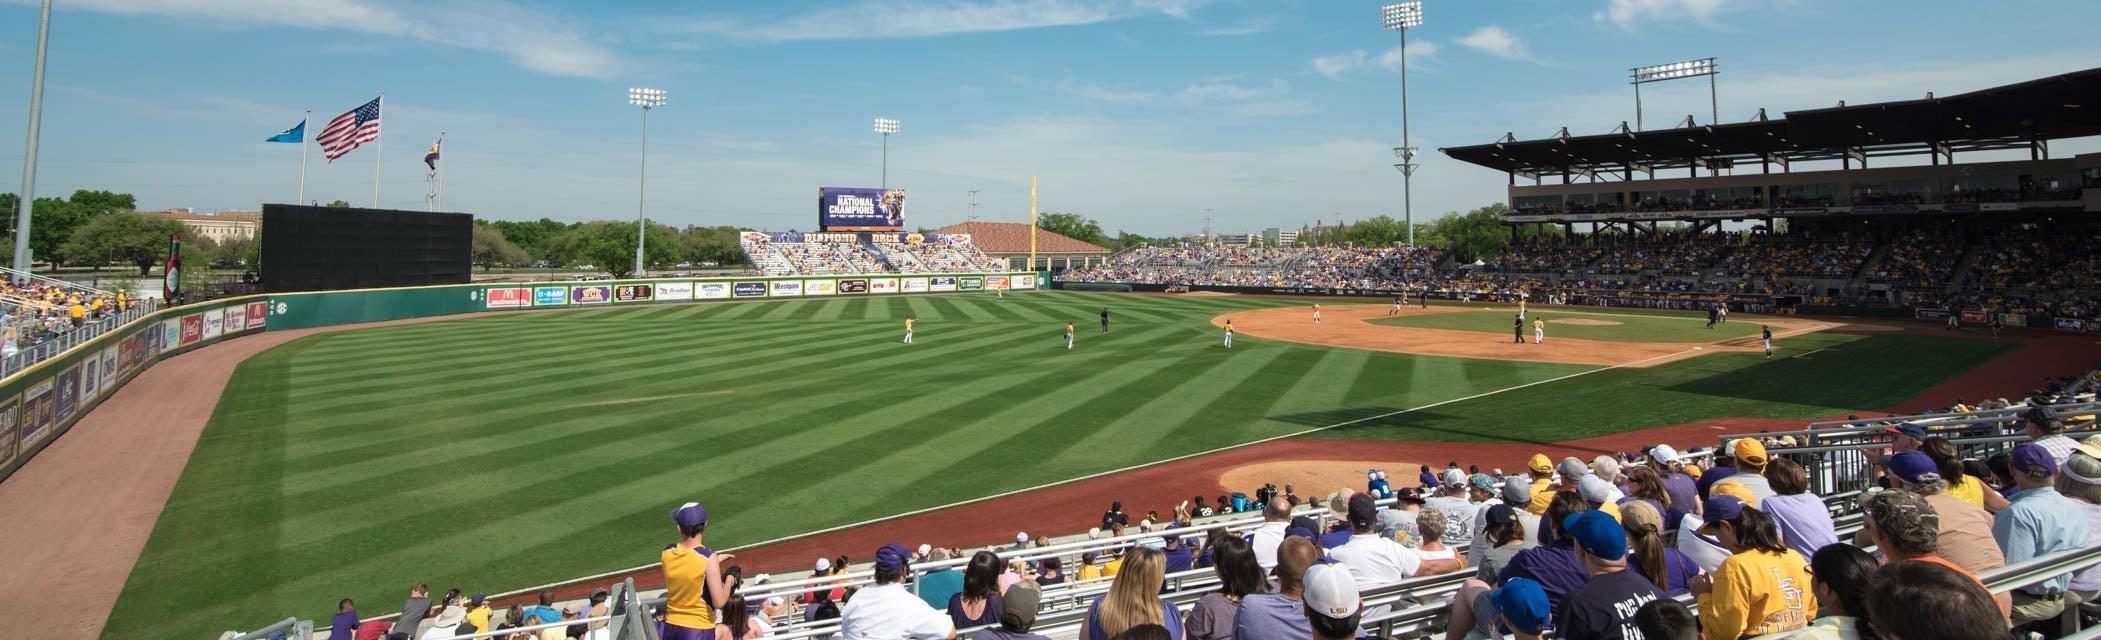 Seat view from Outfield Bleacher Regular